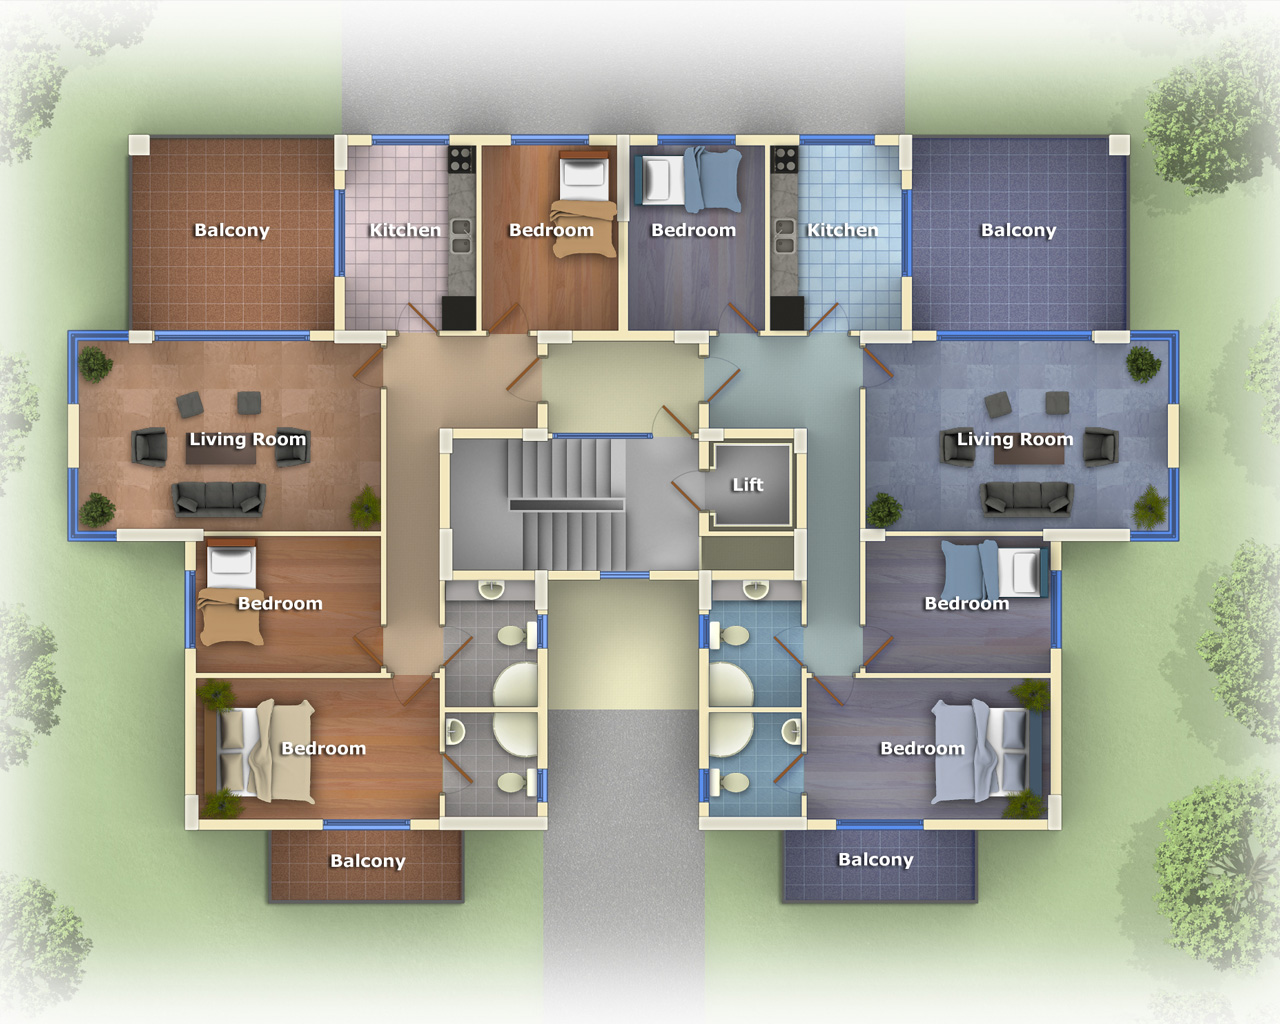 Architecture_Interior_Plans04.jpg